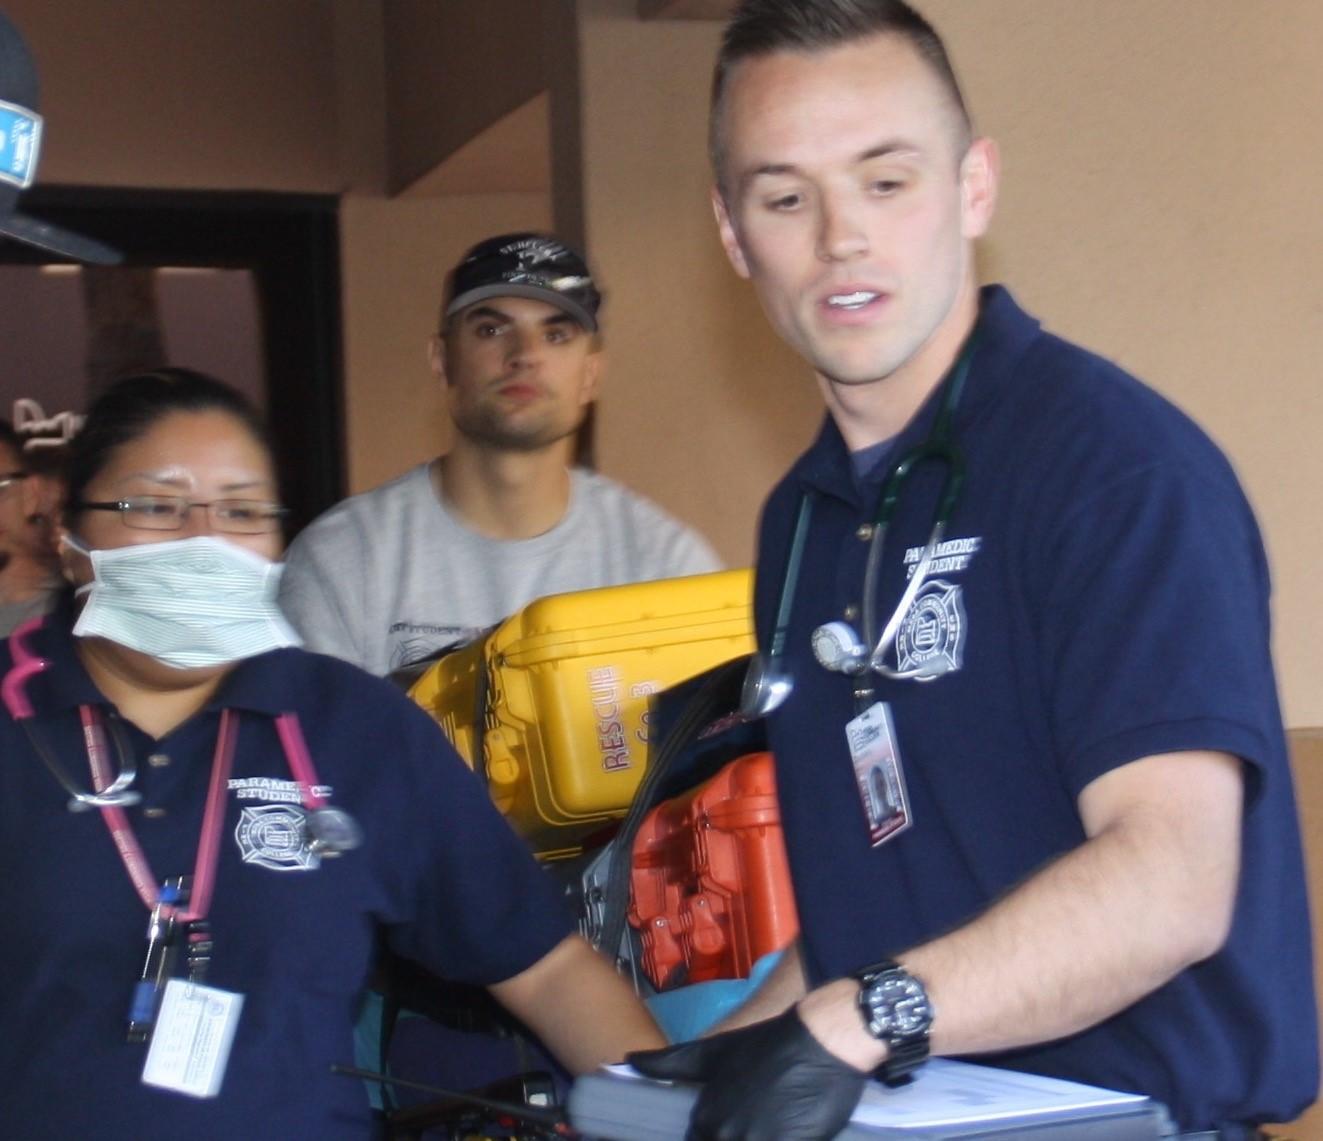 MCC Paramedic